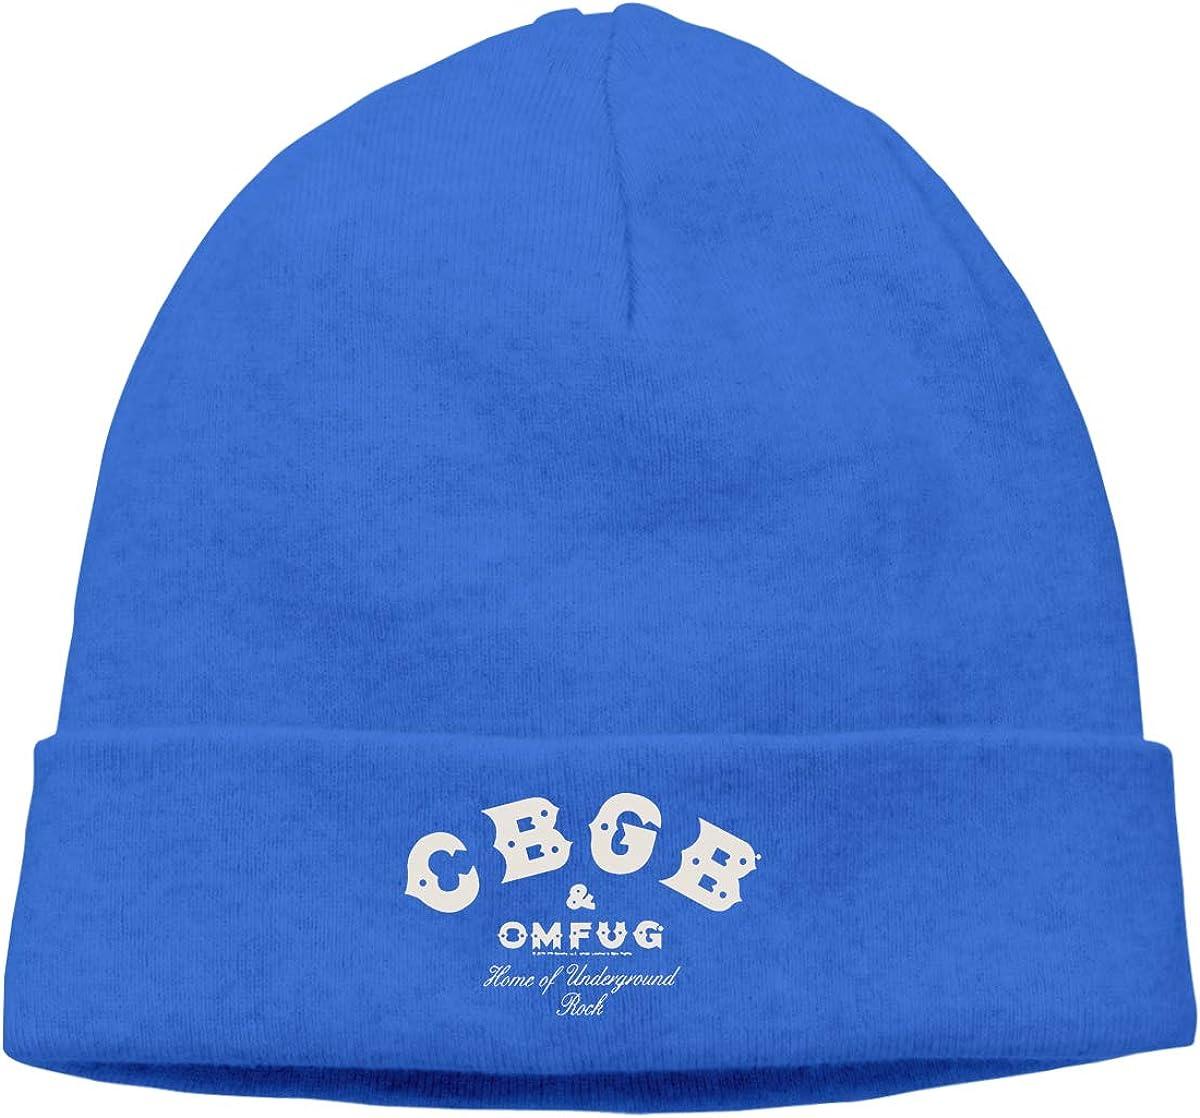 CBGB New York Unisex Cuffed Plain Skull Cap Stretchy Soft Beanie Hat